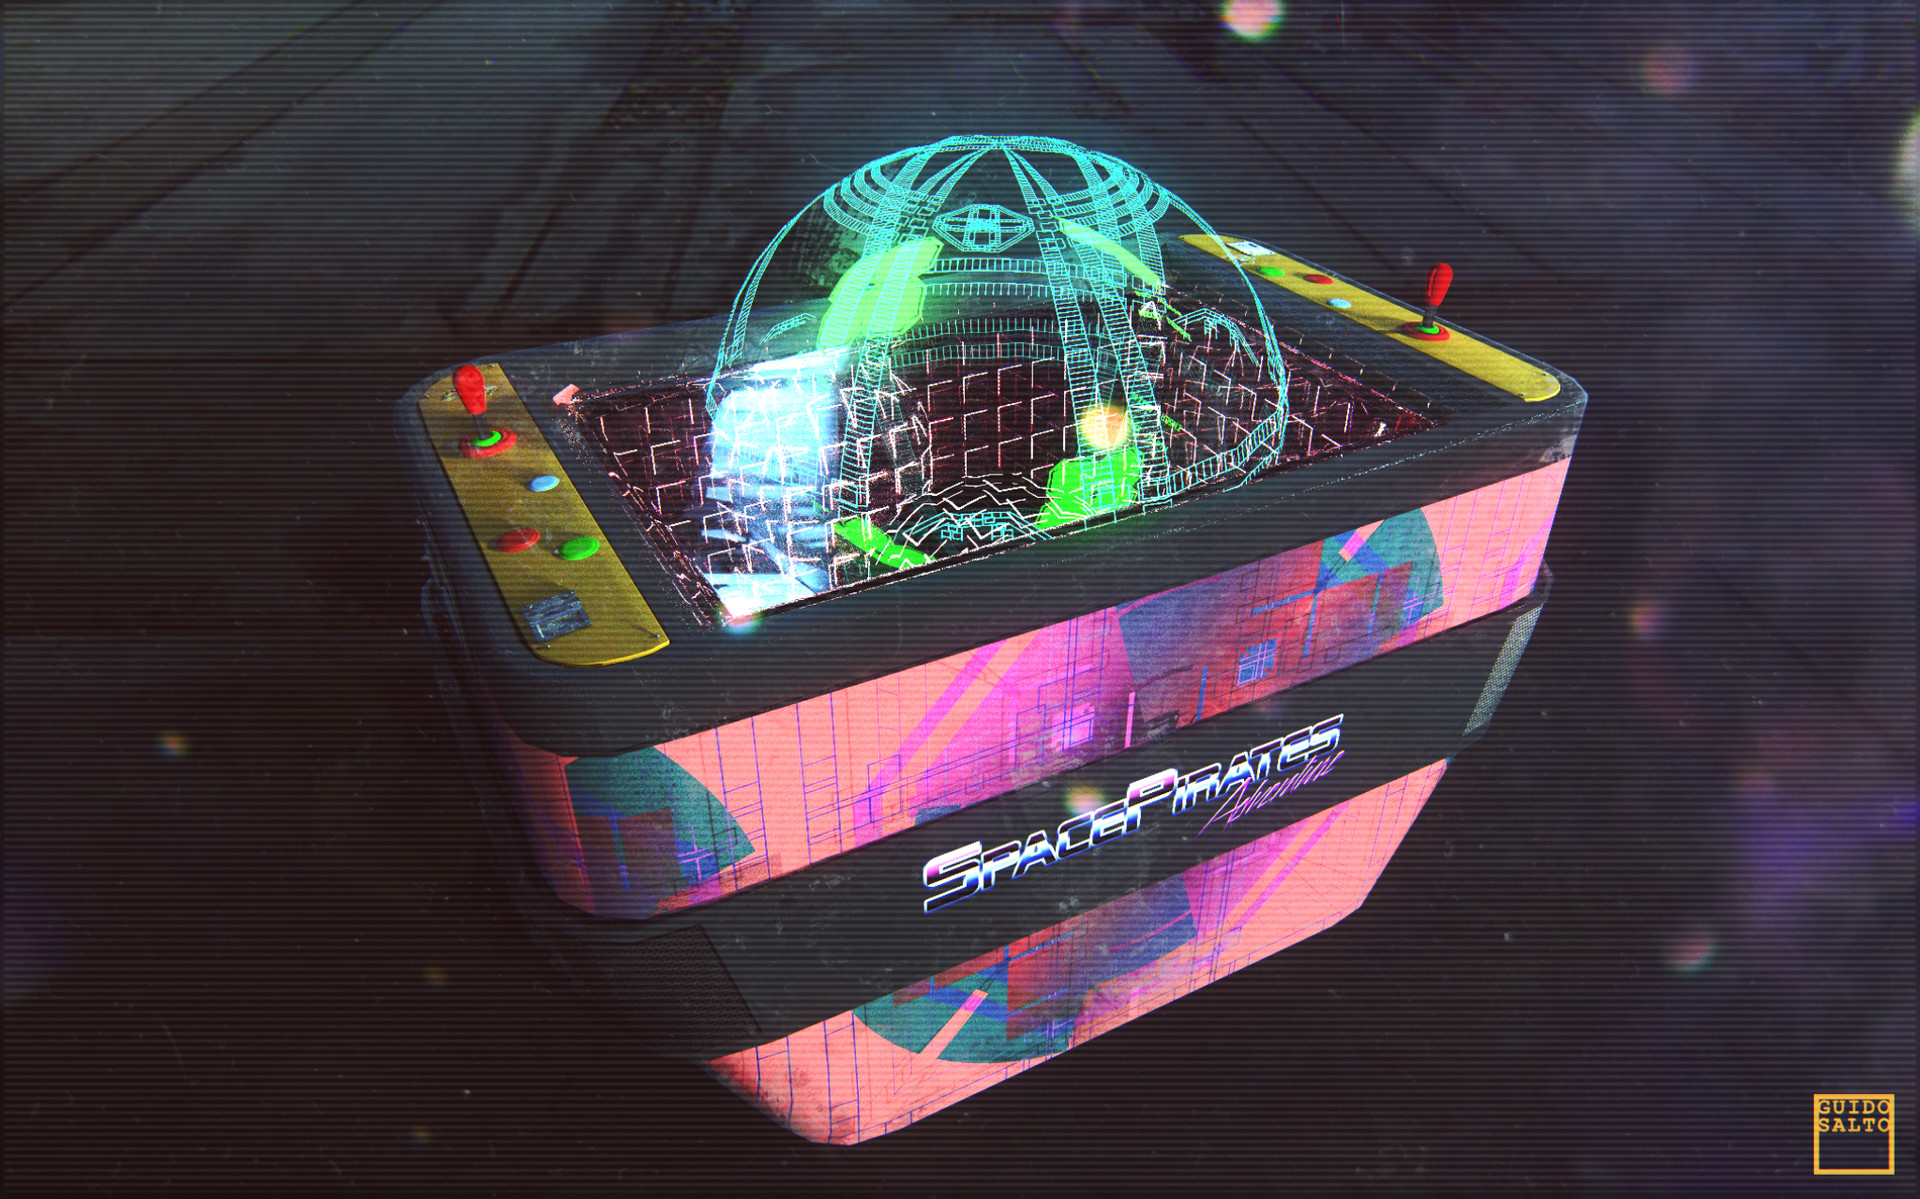 Guido salto 01172017 prp arcade dire 01gs